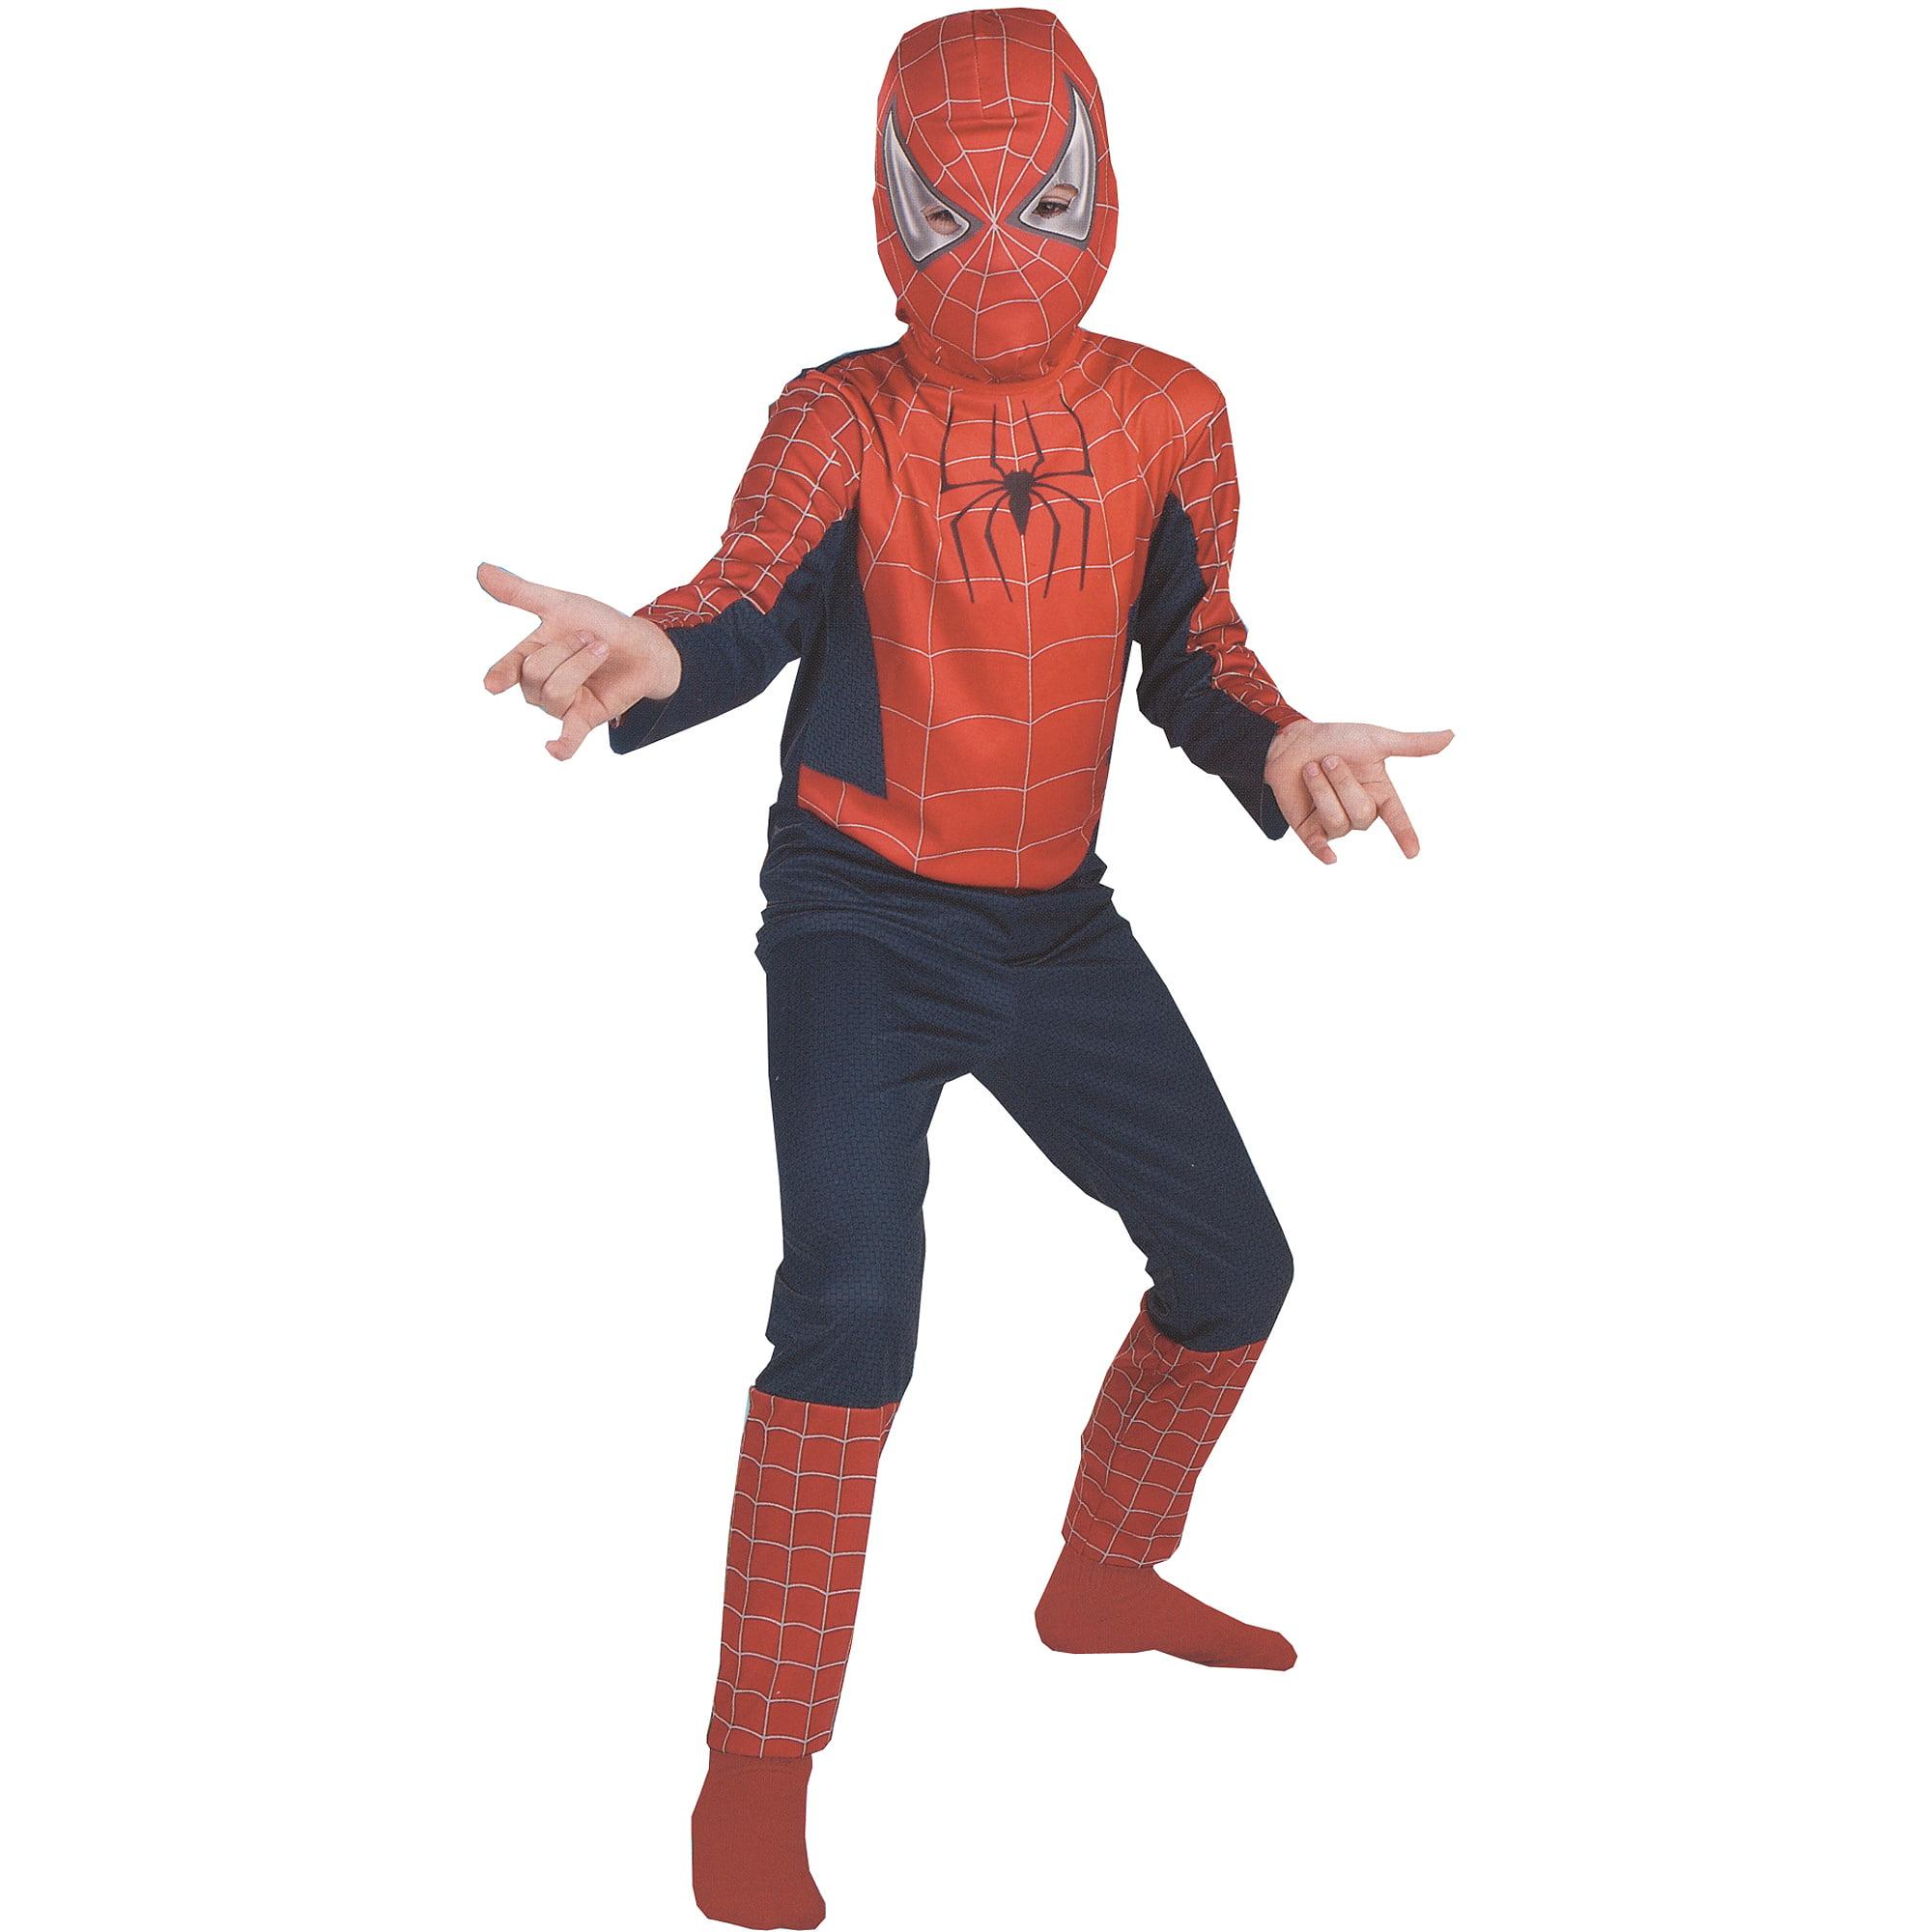 The Amazing Spider-Man Child Halloween Costume